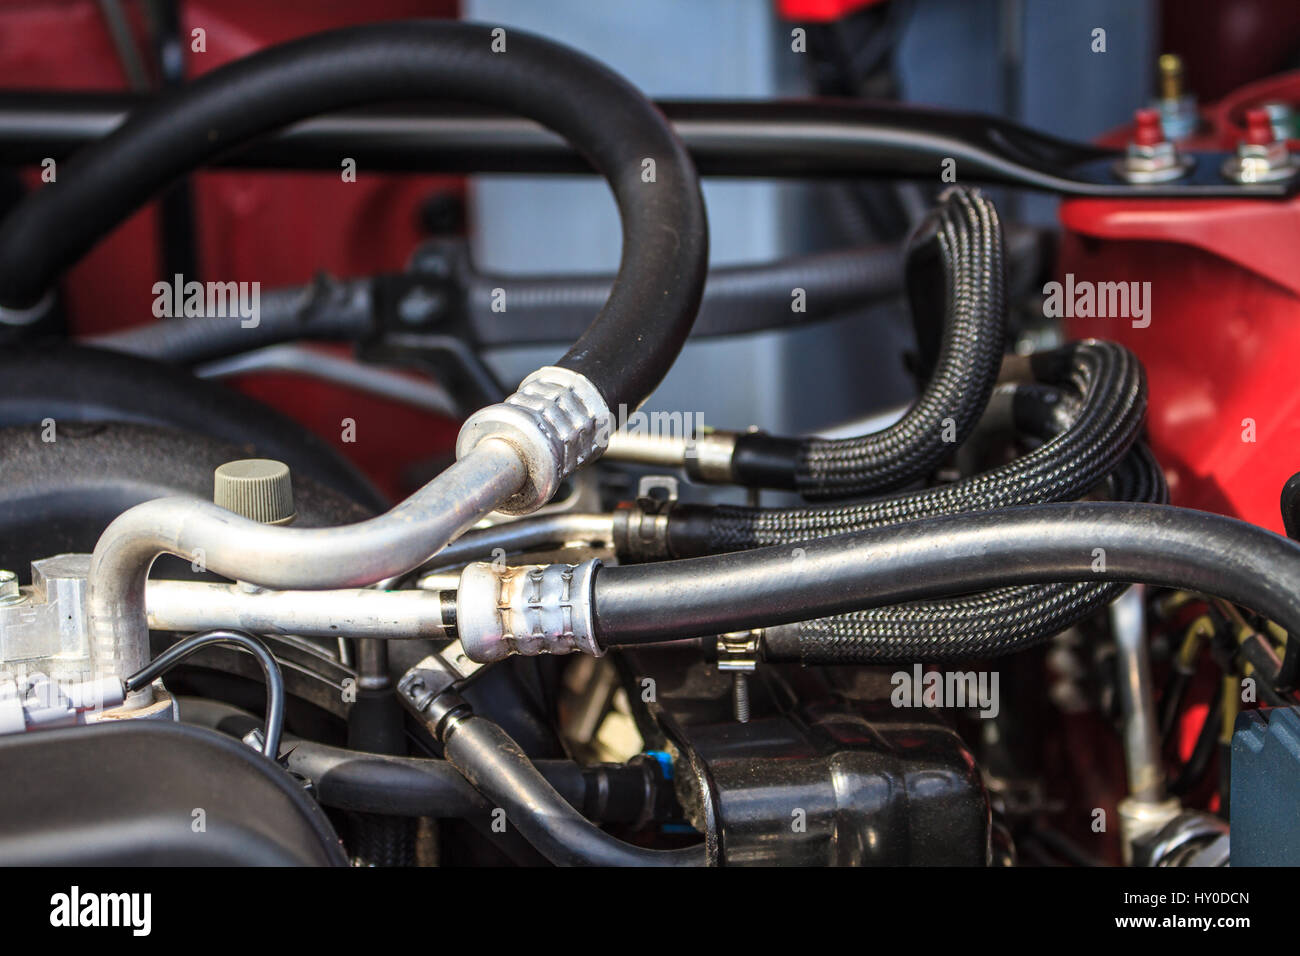 Car Engine Fragment Automobile Motor Stockfotos & Car Engine ...